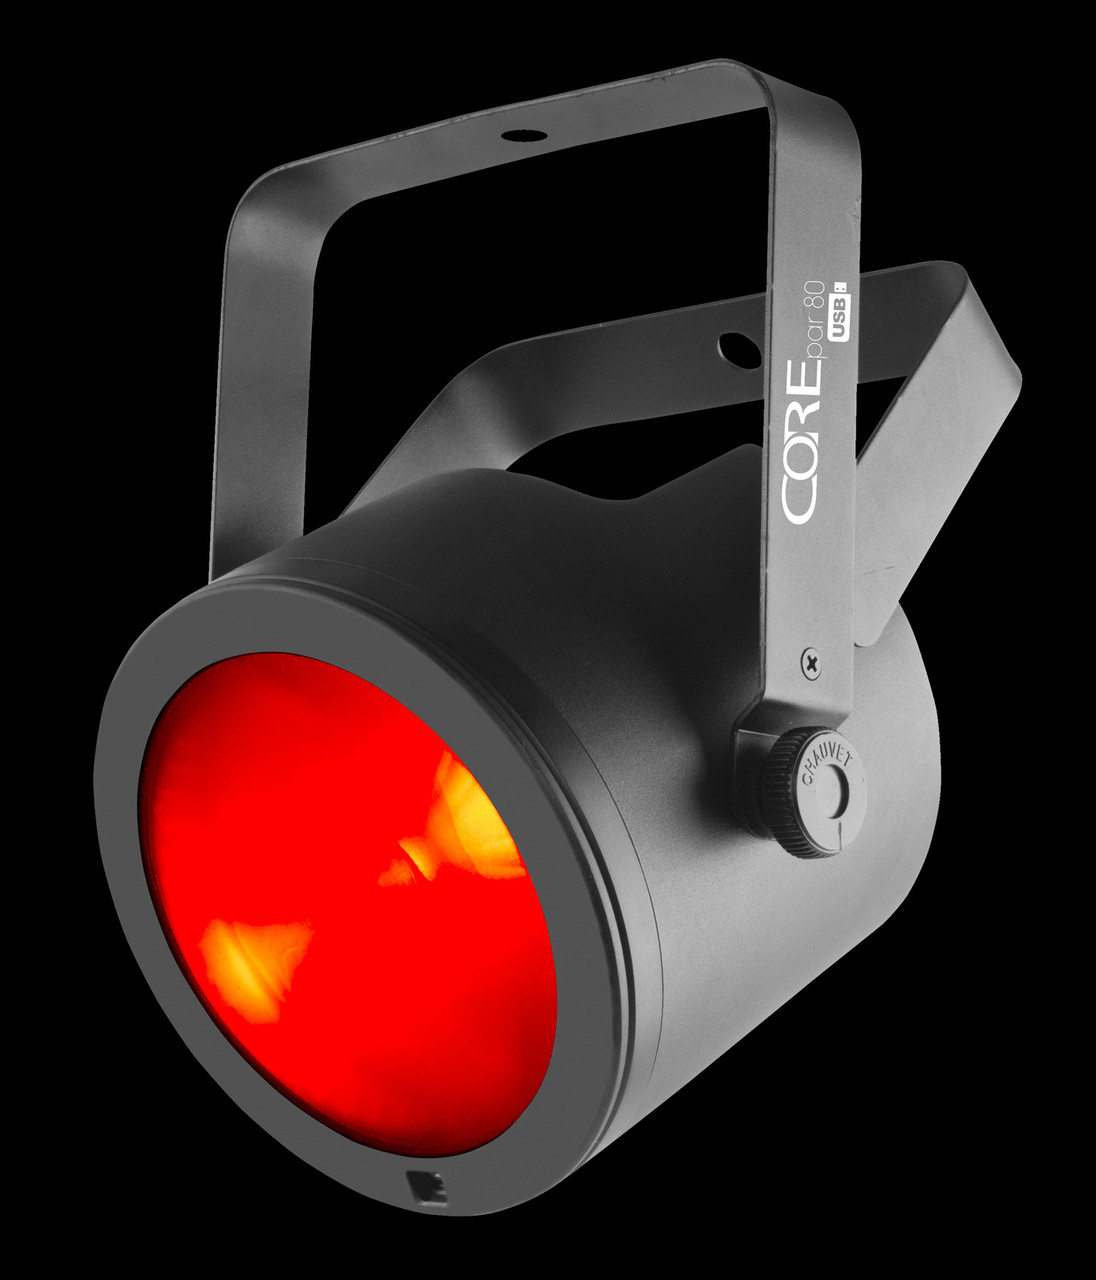 Chauvet Dj Corepar 80 Usb Full Spectrum Led Par Light Phantom Dynamics Circuit Board Buy Boardled